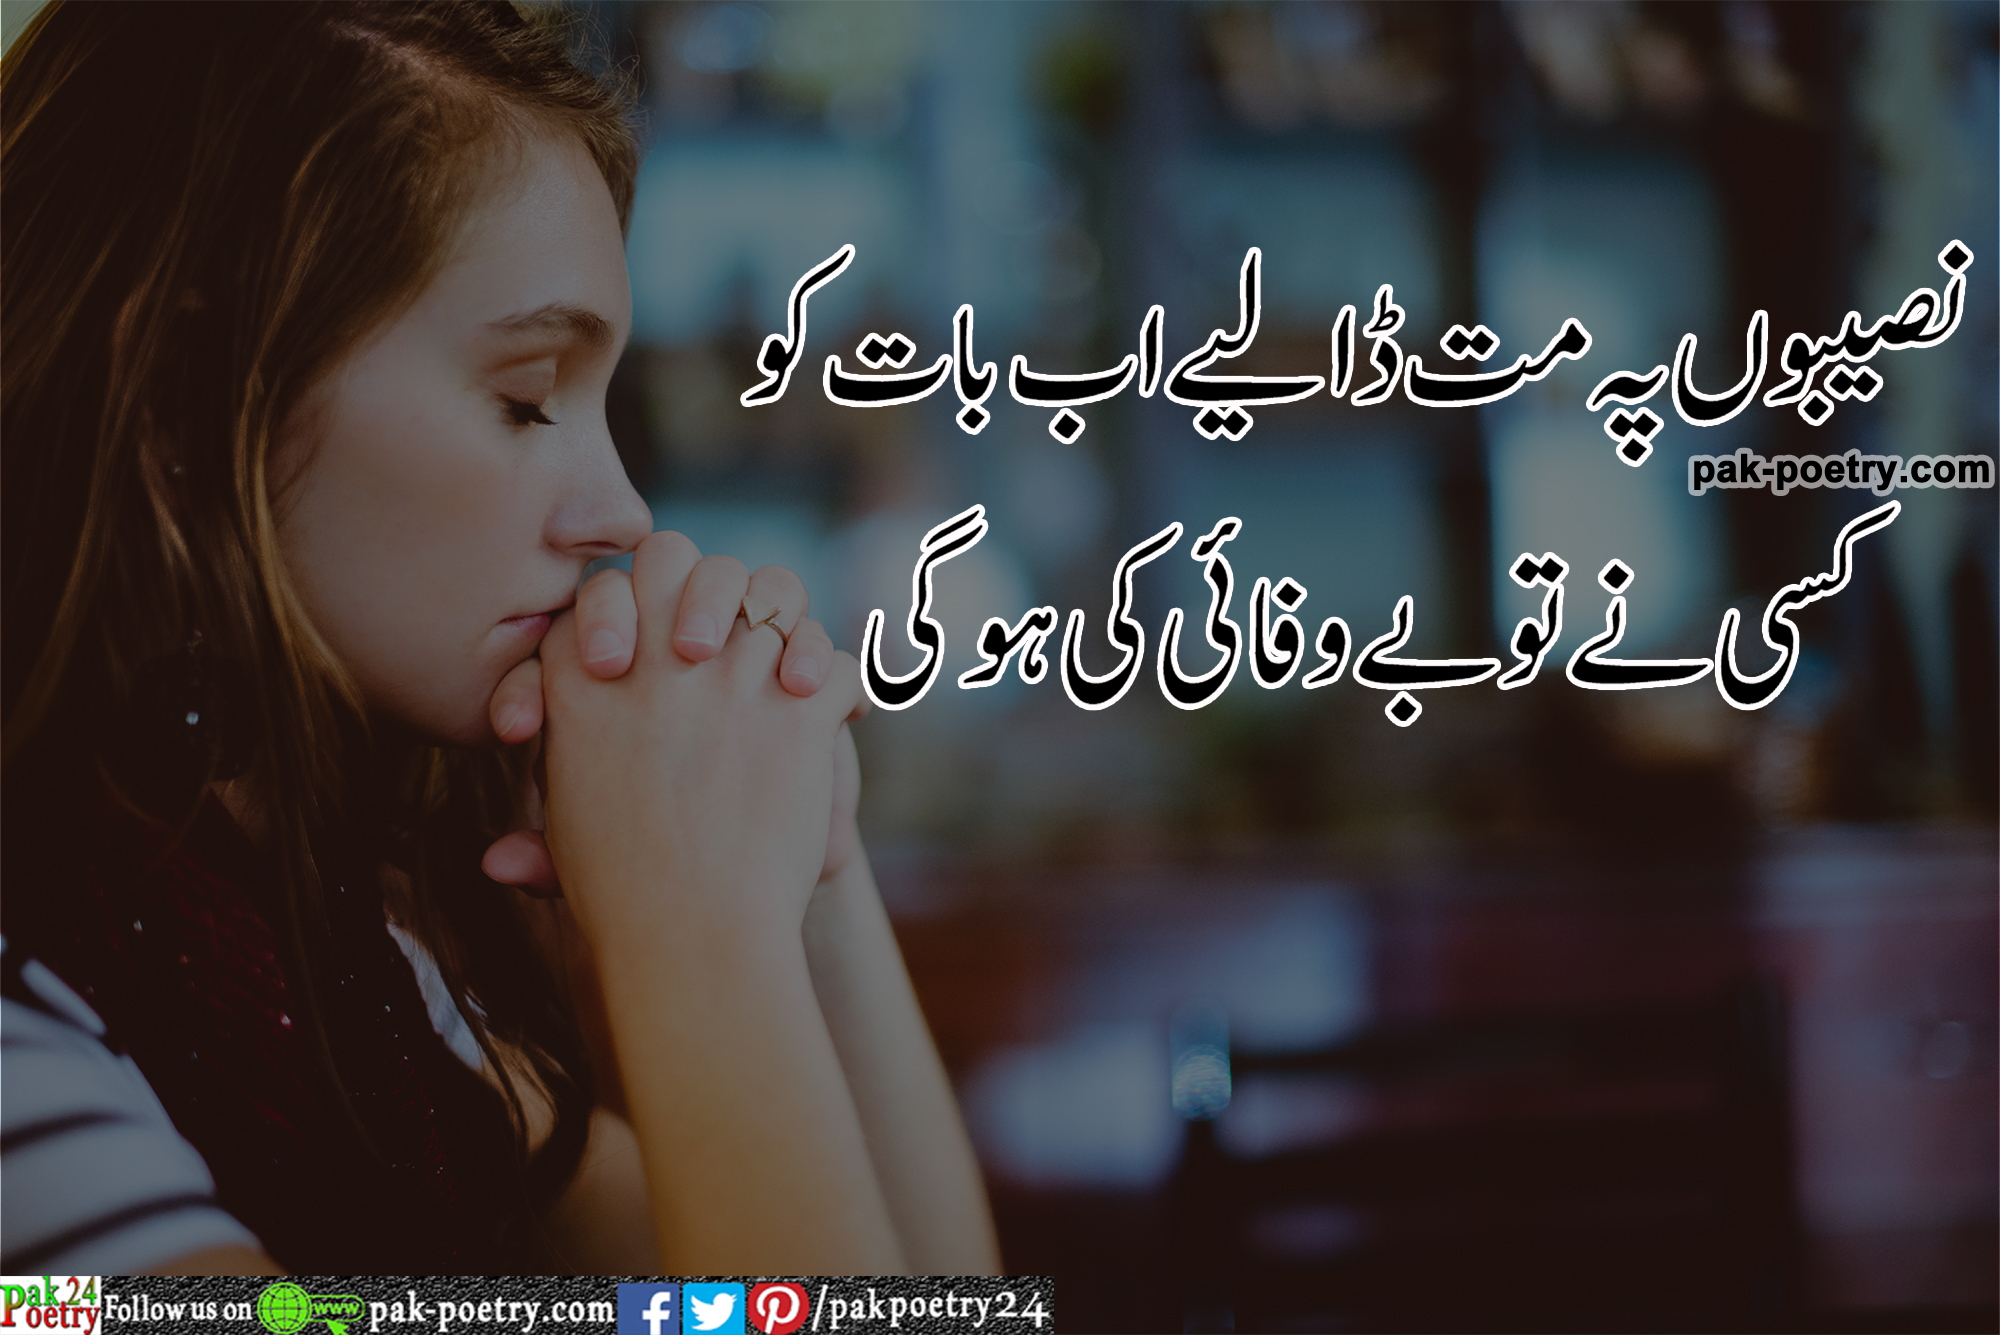 Sad poetry, sad poetry in urdu, poetry sad, sad poetry urdu, urdu sad poetry, sad poetry pics, poetry in urdu sad, Poetry in urdu, urdu poetry, poetry urdu, Bewafa poetry, bewafa, bewafa sad poetry, bewafa poetry in urdu, bewafa poetry sad, bewafa sad poetry in urdu, poetry bewafa, sad bewafa poetry, bewafa poetry urdu, bewafa photo,